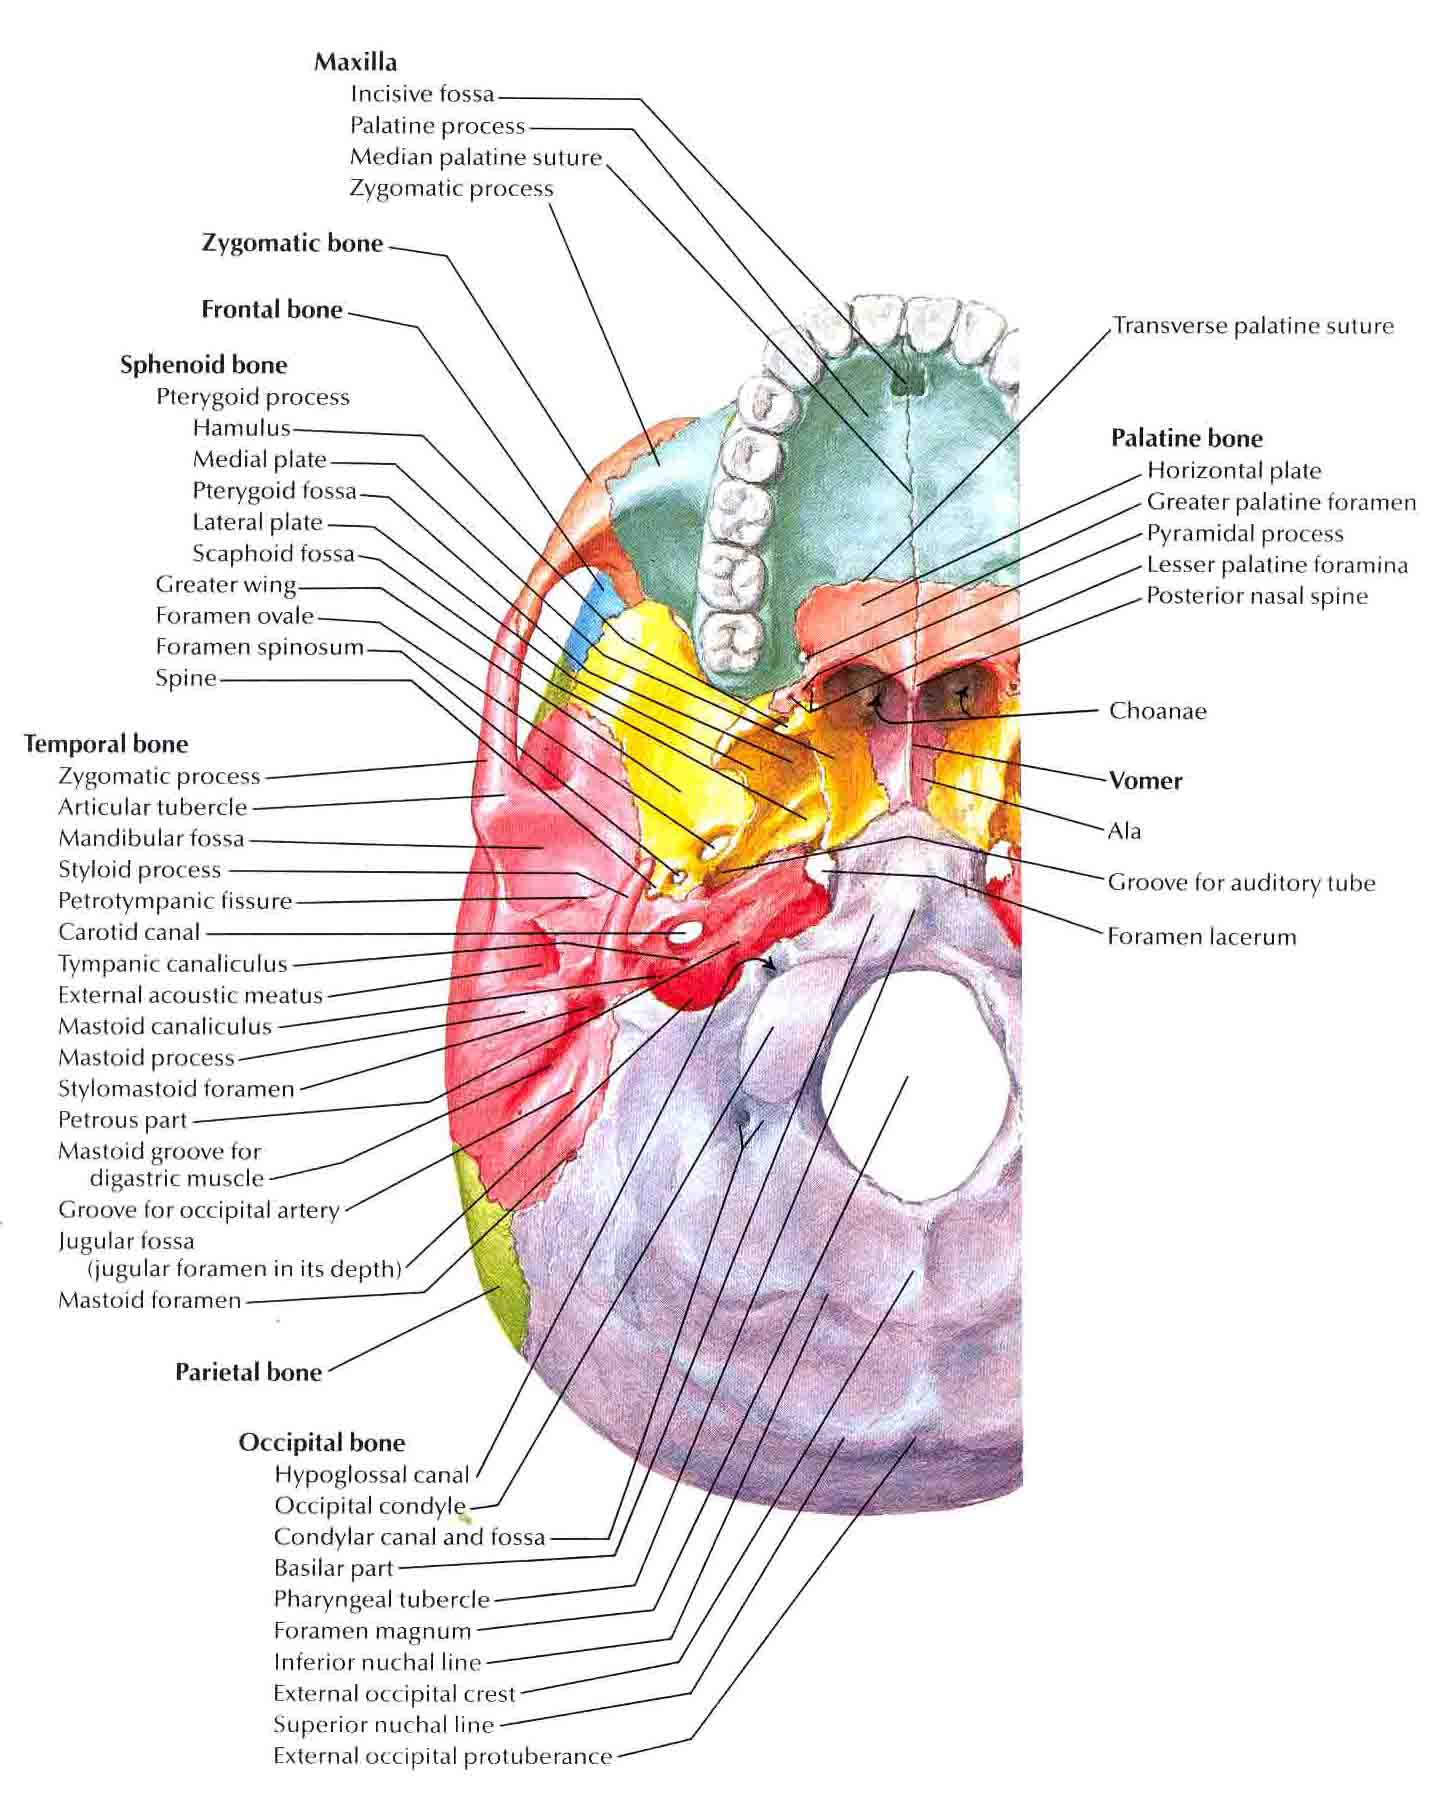 Anatomi patologi organ bedahunmuh 39 s blog for Schema fossa imhoff dwg